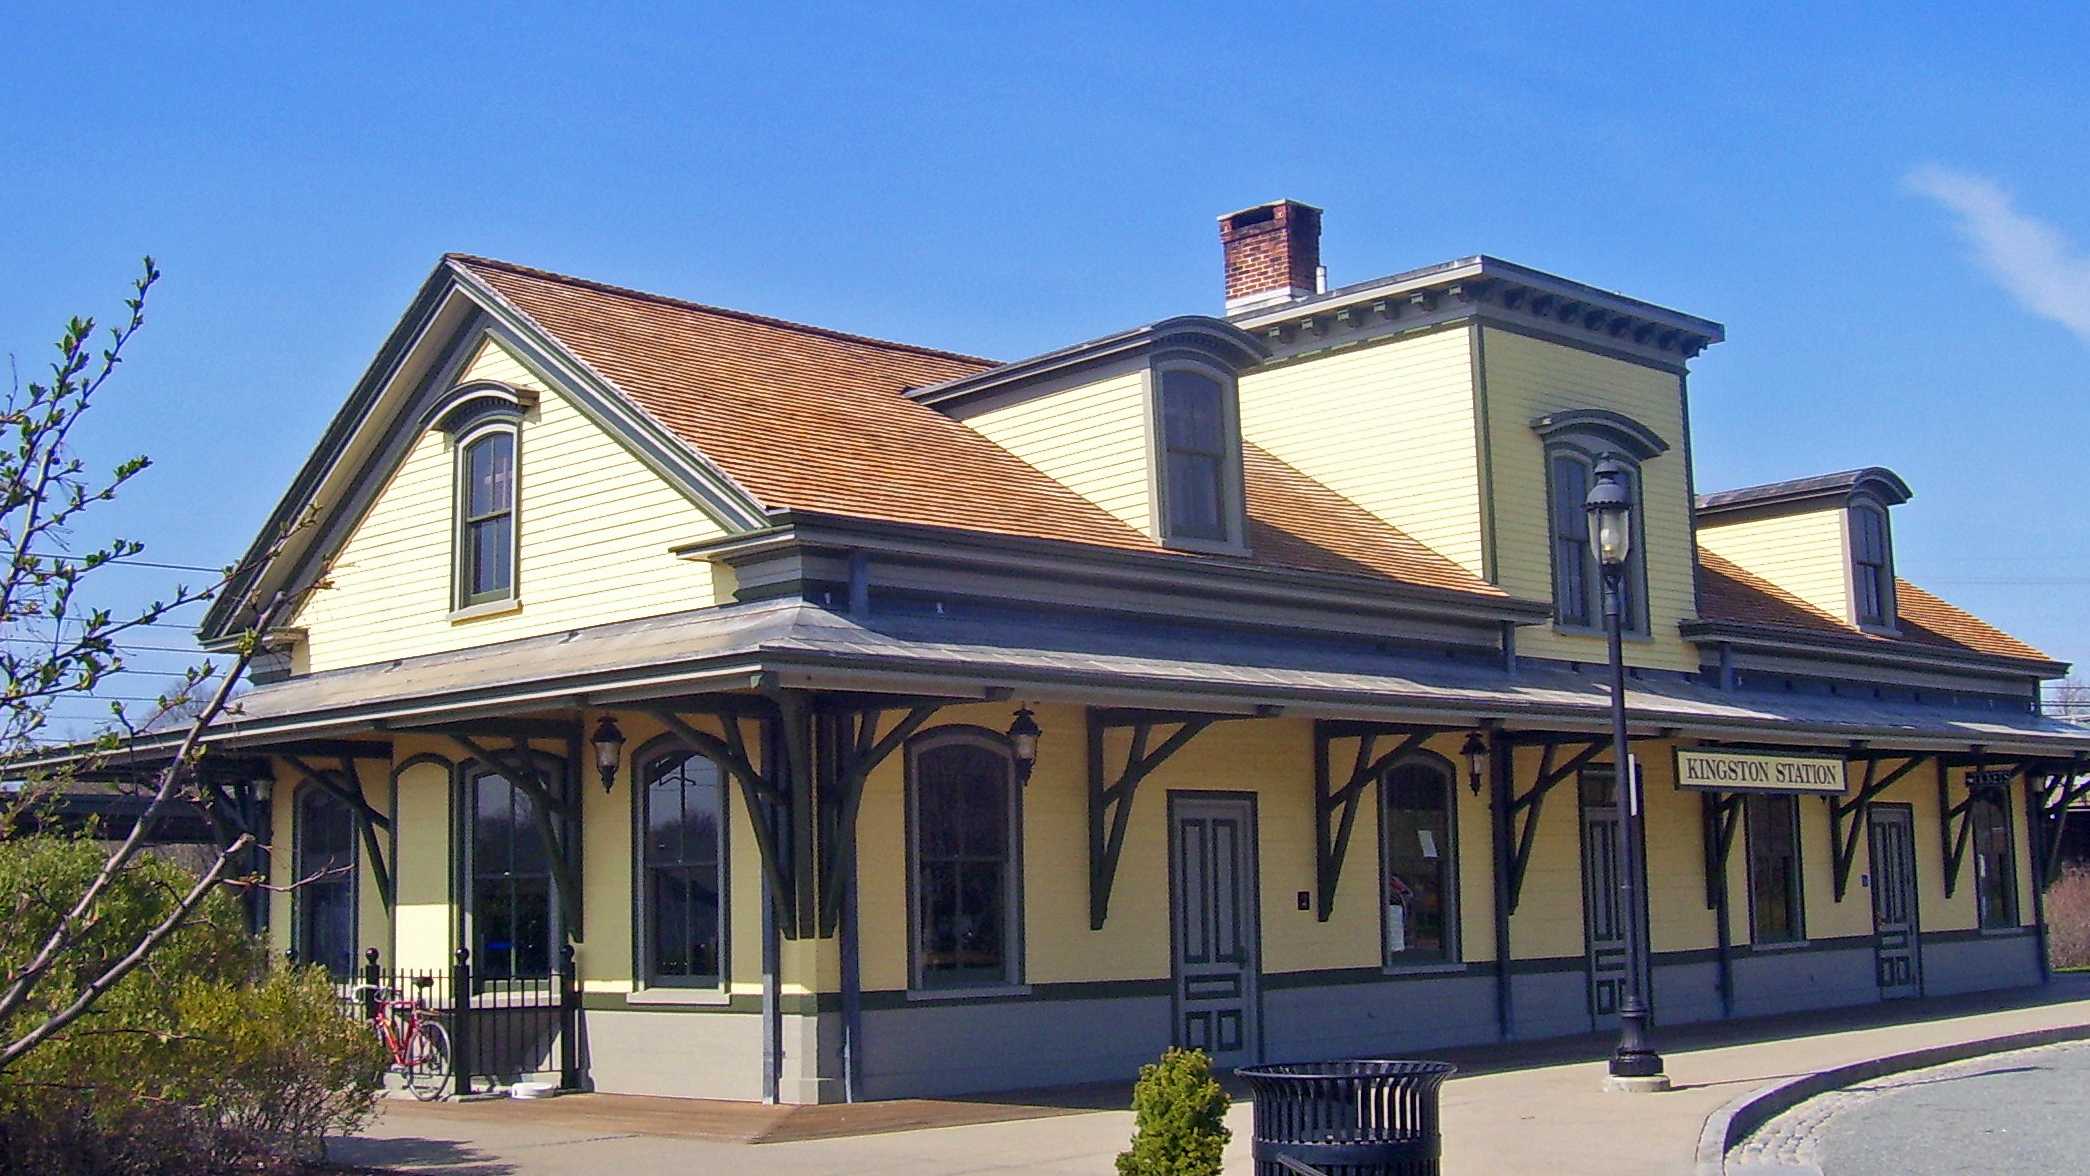 The Kingston Railroad Station